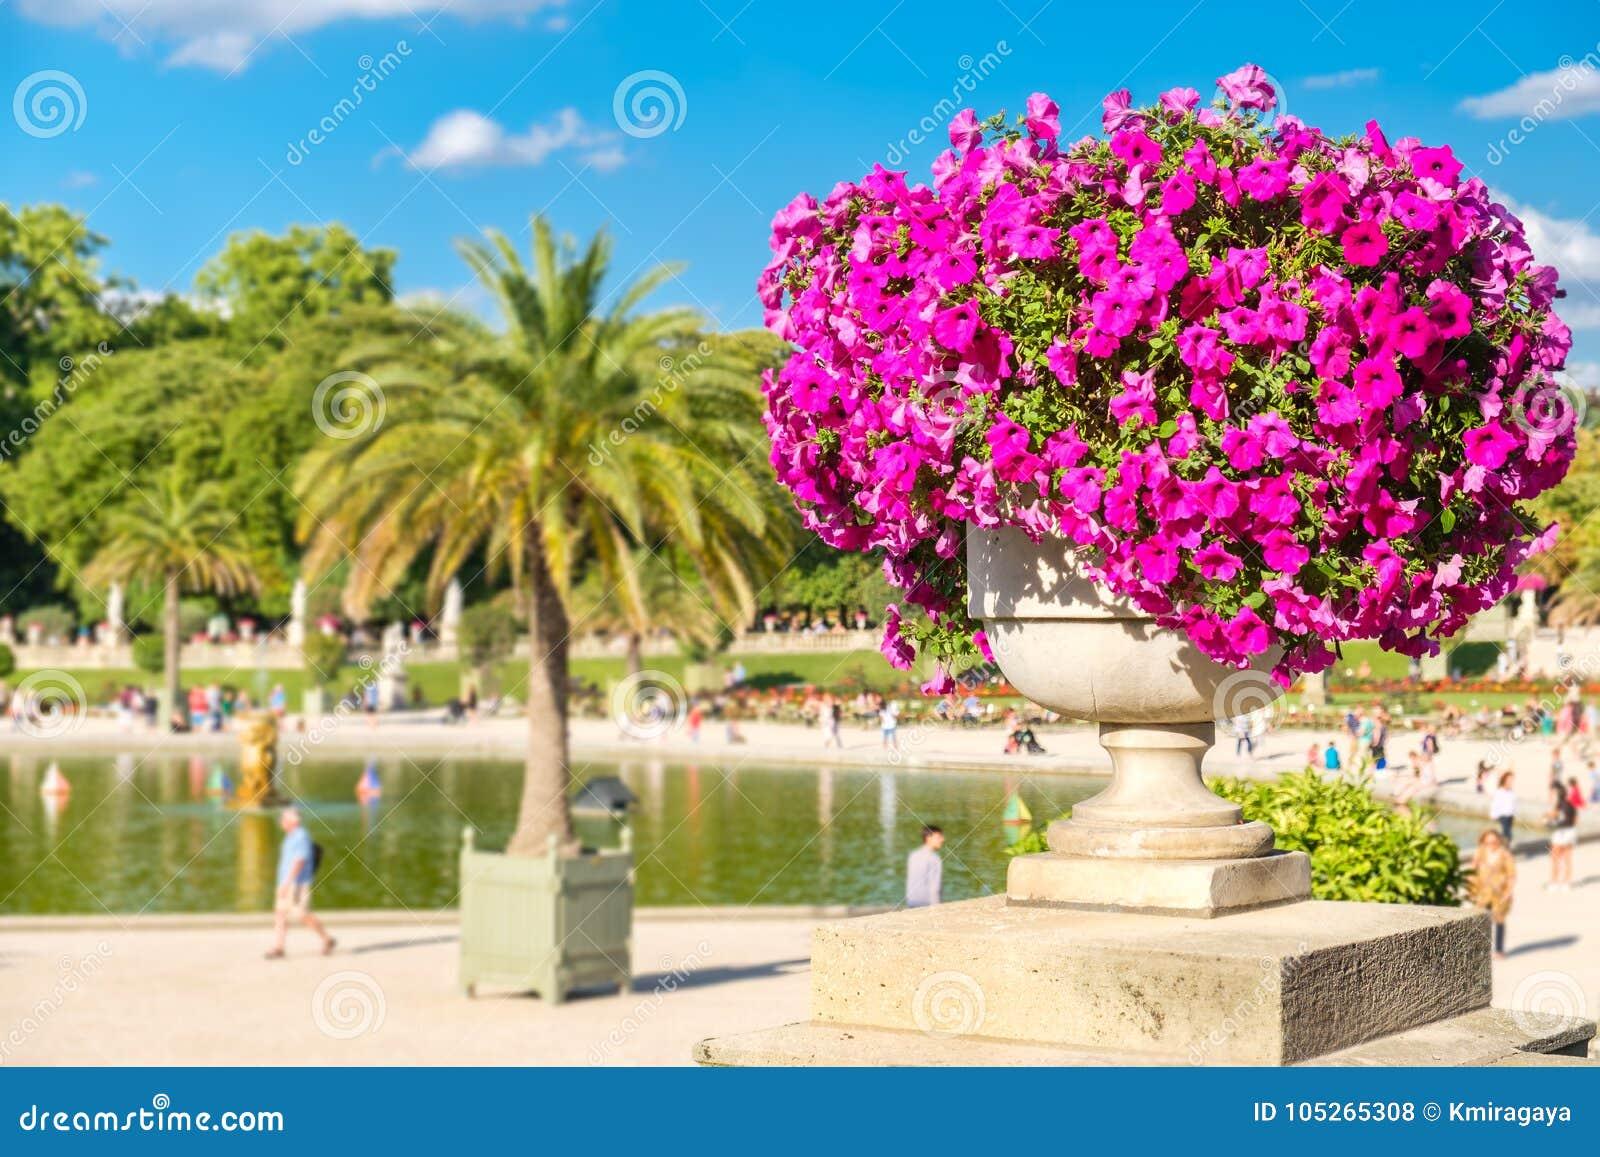 The Luxembourg Garden in Paris